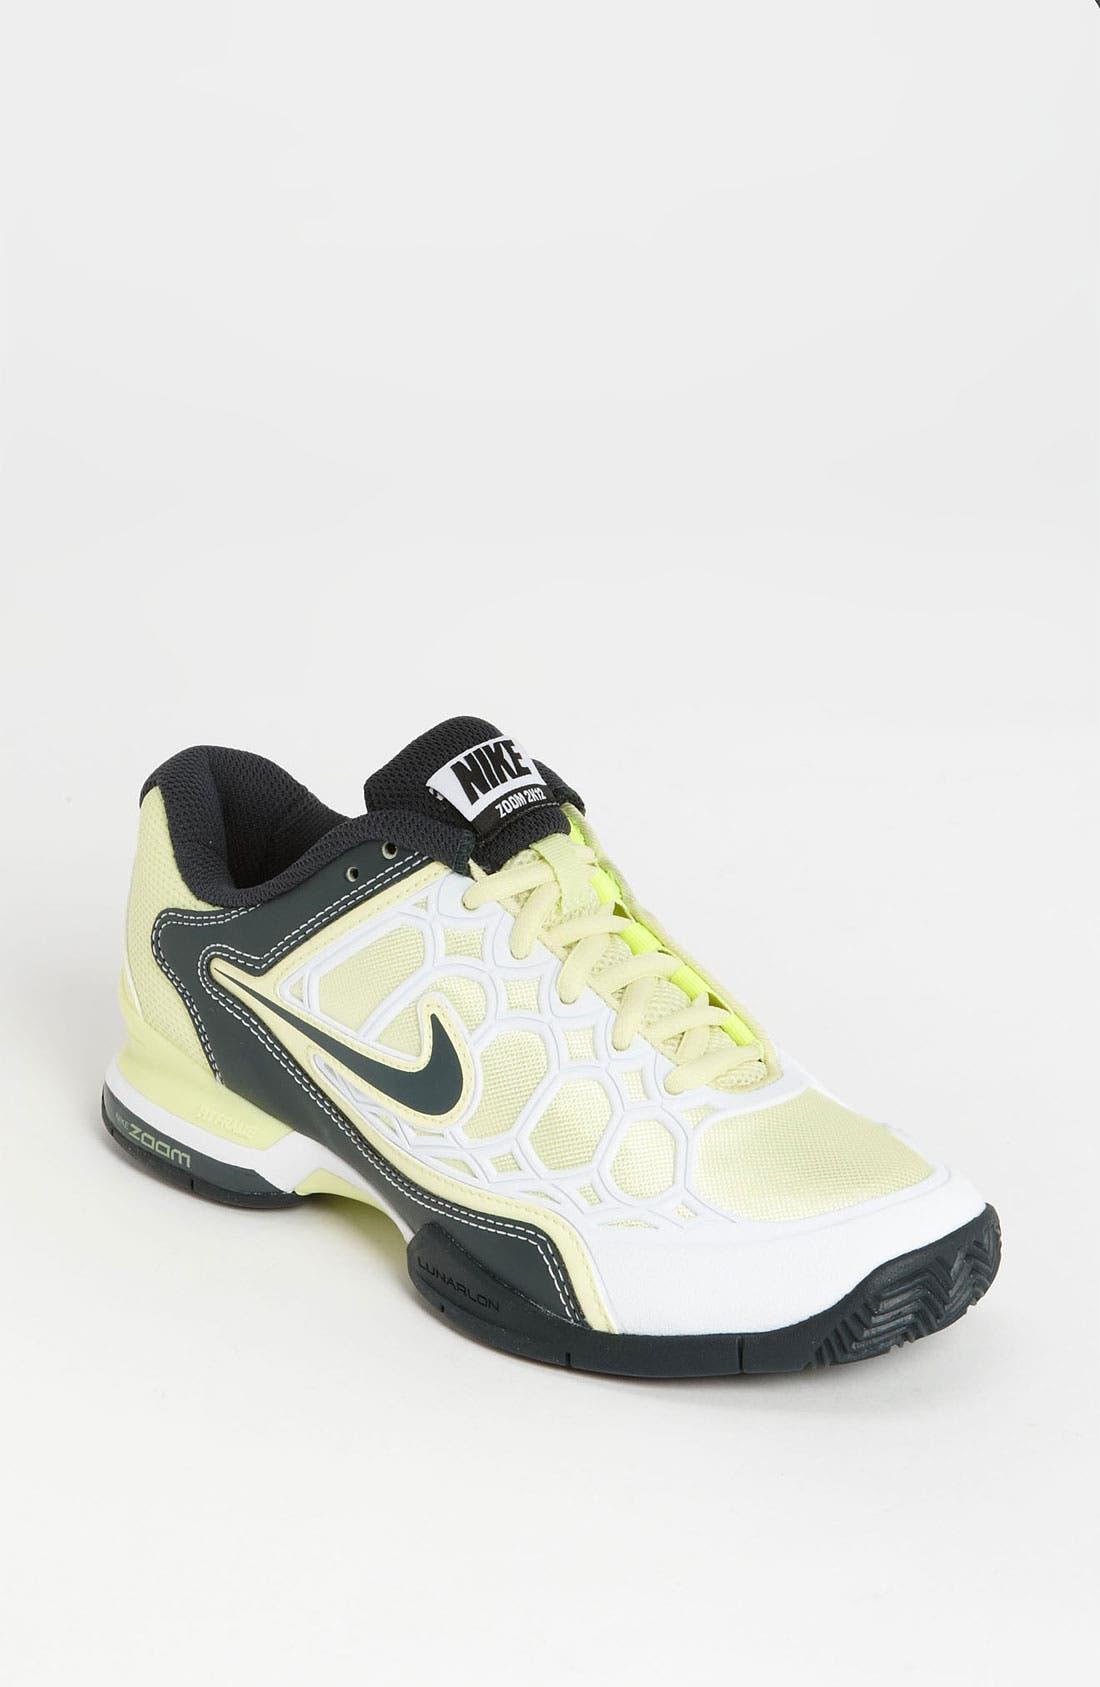 Main Image - Nike 'Zoom Breathe 2K12' Tennis Shoe (Women)